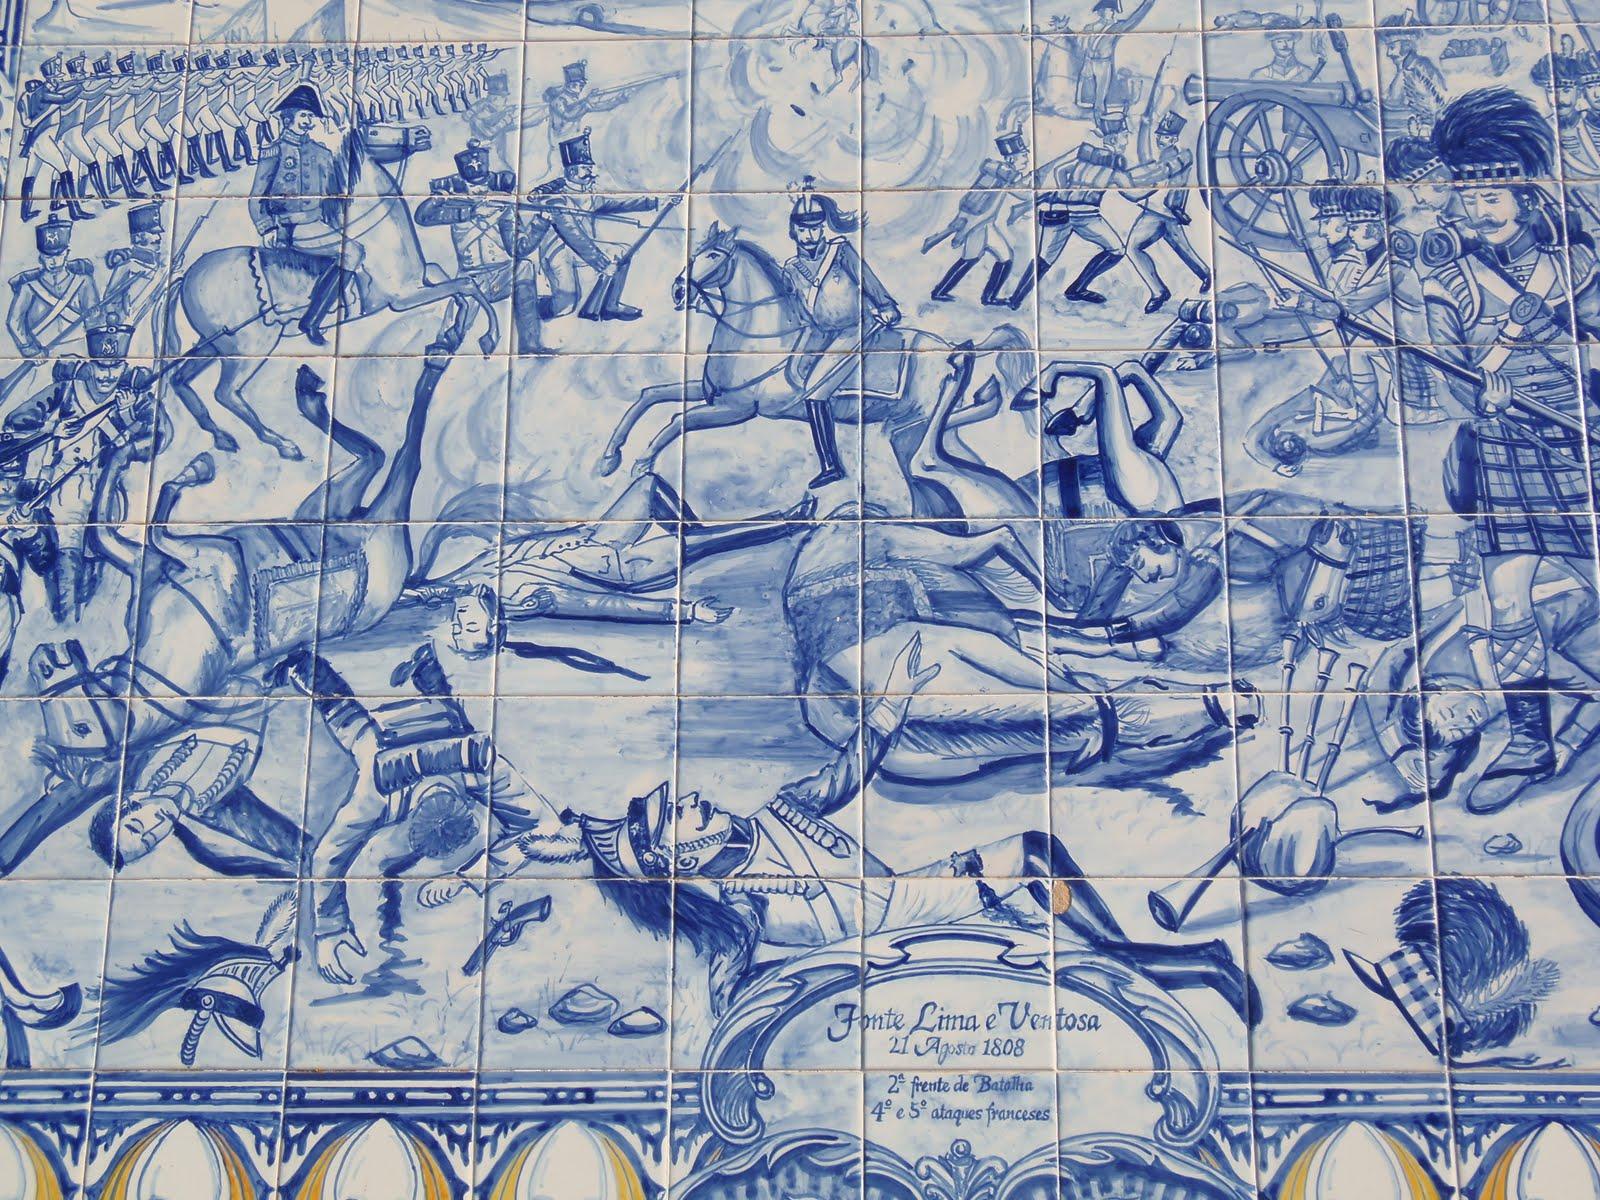 Dennis Dunleavy - Symbols of Portugal\'s Colorful Past